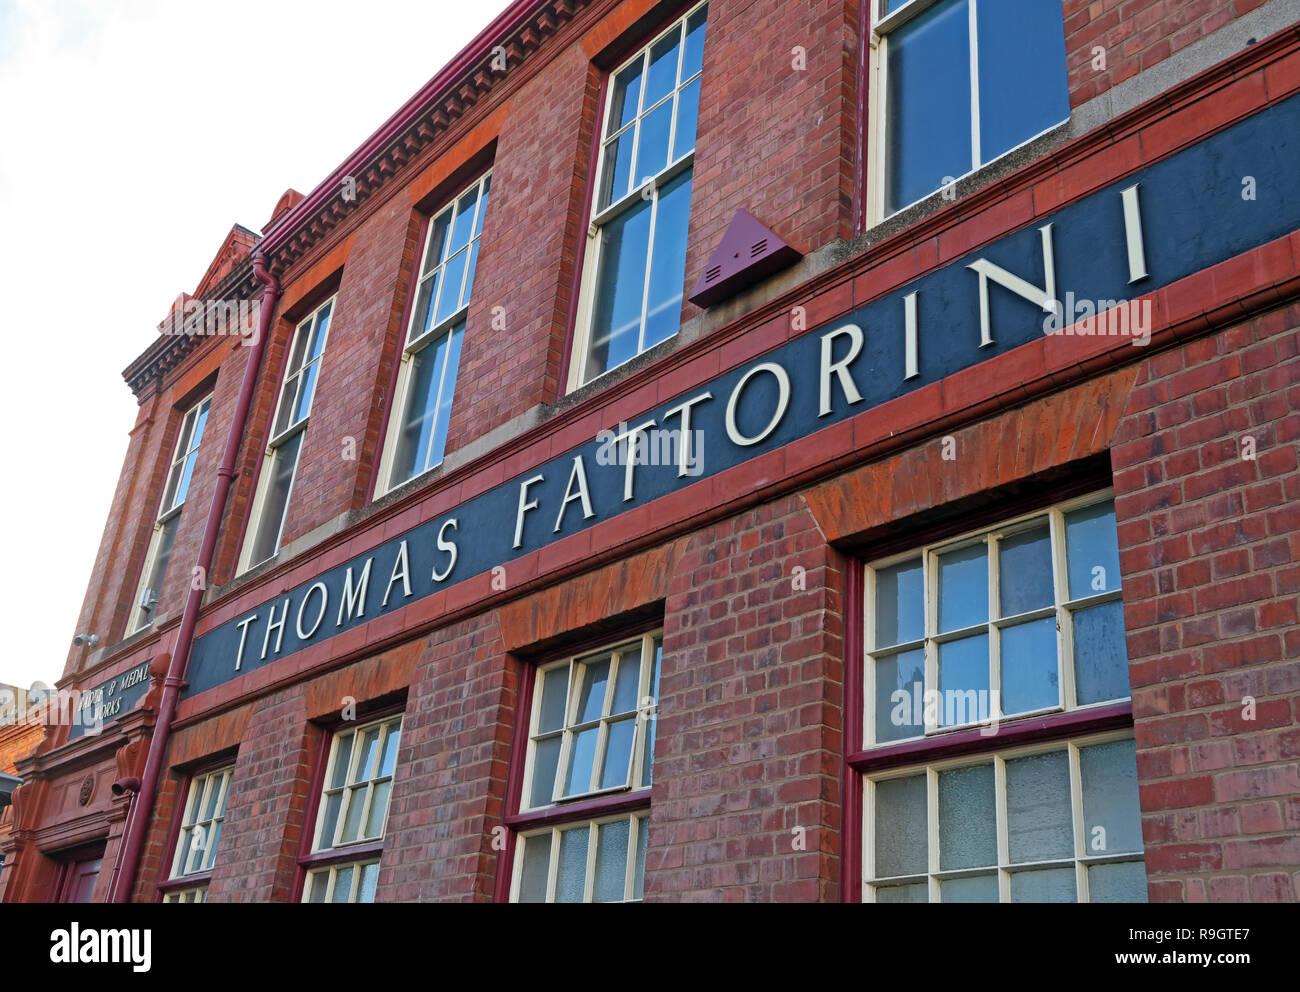 Thomas Fattorini factory, Birmingham Jewellery quarter, Regent St, Birmingham, English Midlands, UK,  B1 3HQ - Stock Image